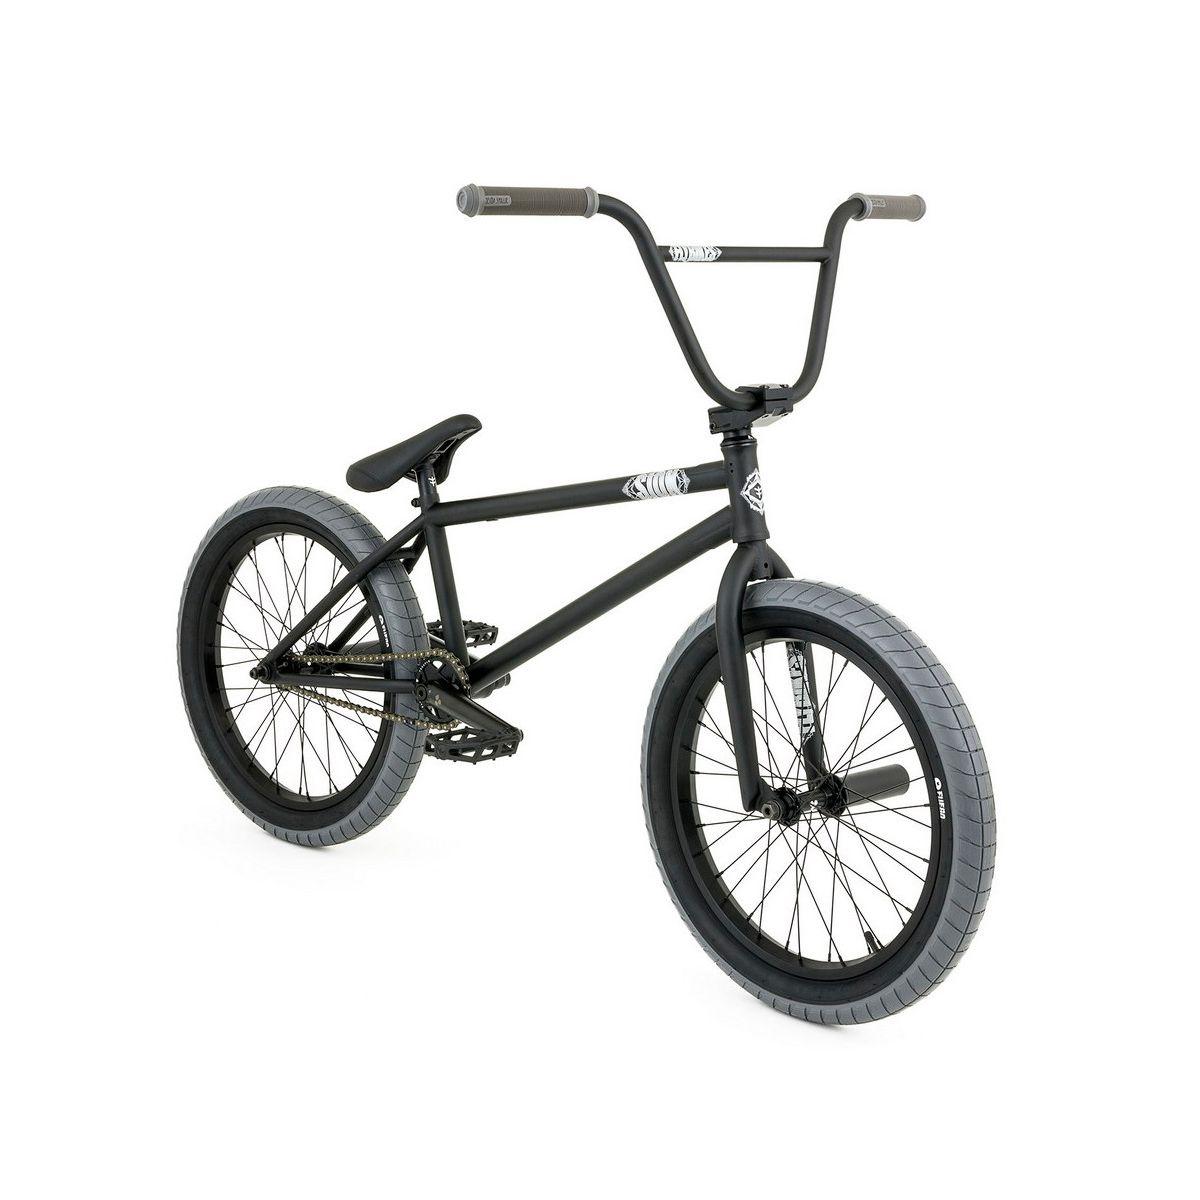 Rower Bmx Flybikes Sion 8 Flat Black Sklep Avebmx